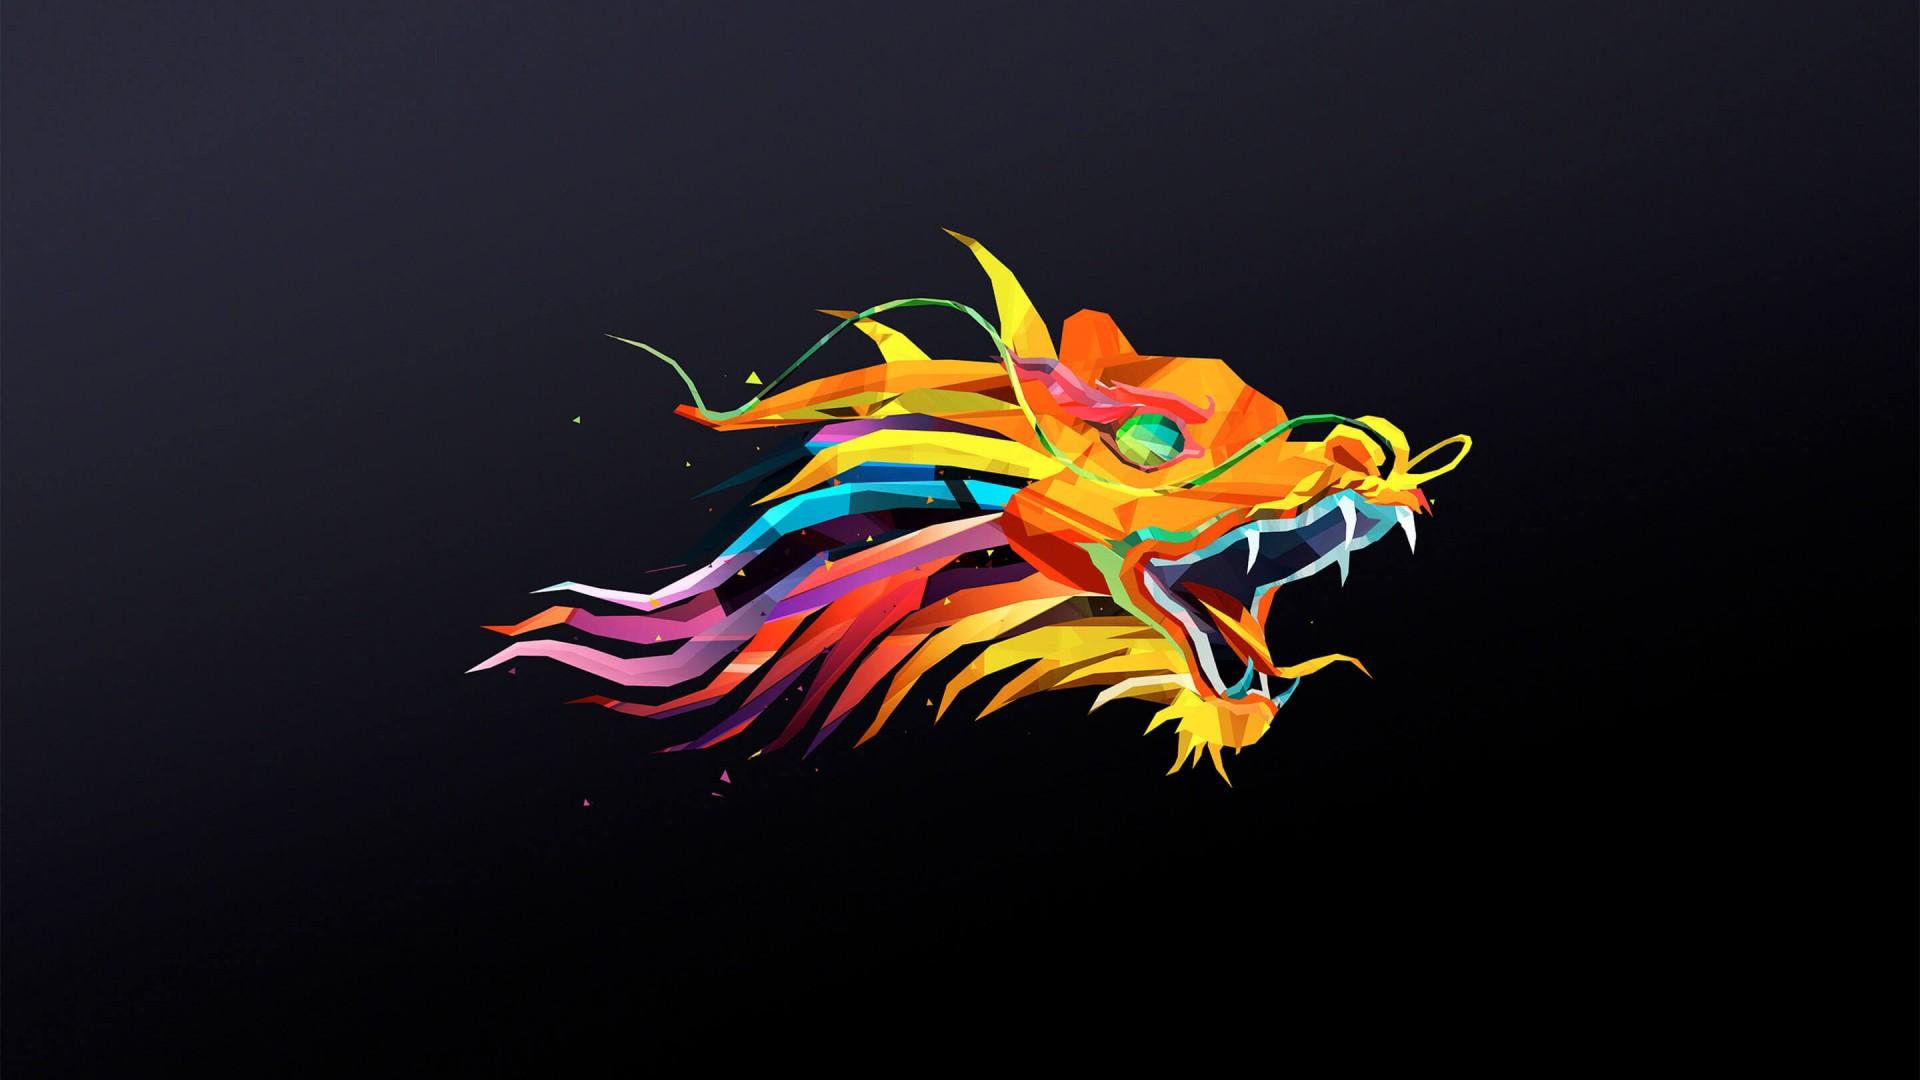 The Dragon Wallpaper for Desktop 1920 x 1080 1920x1080